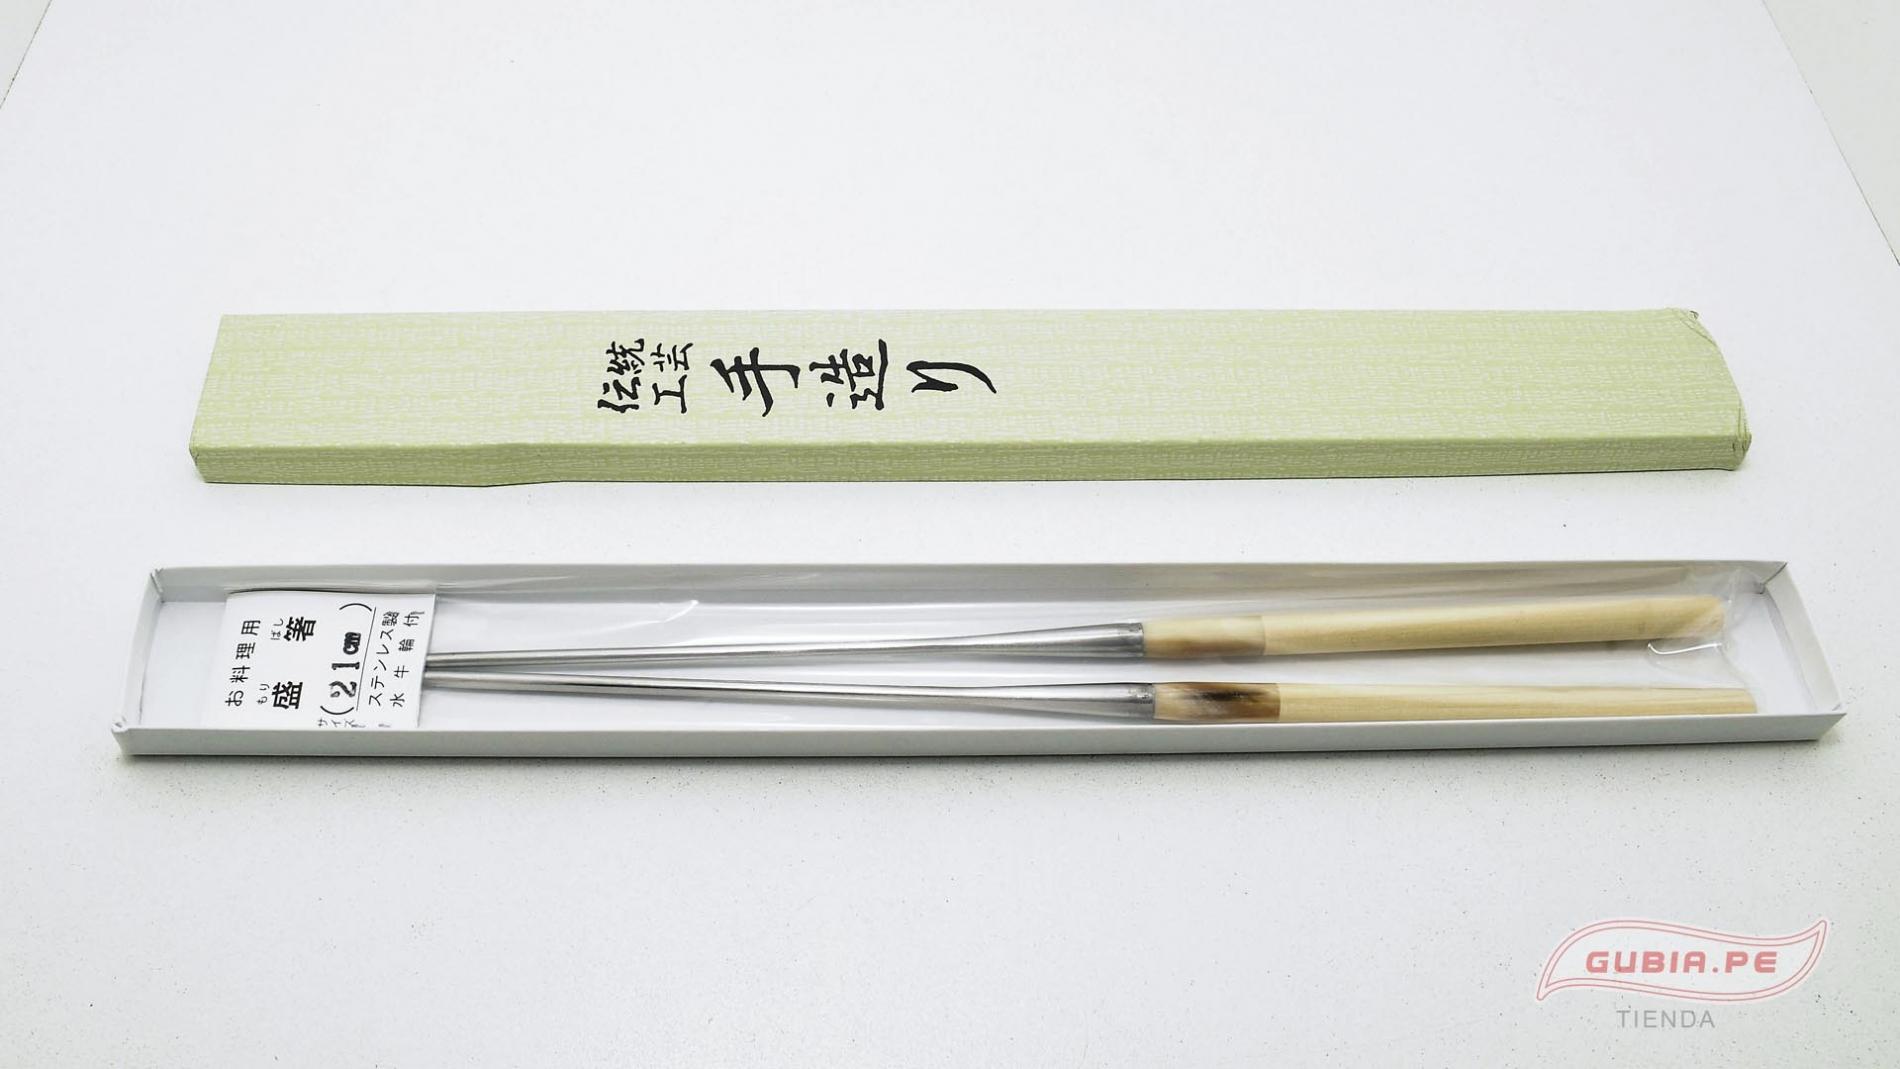 GUB0037-Palitos servir sushi Moribashi Chopsticks metal 21cm GUB0037-max-2.